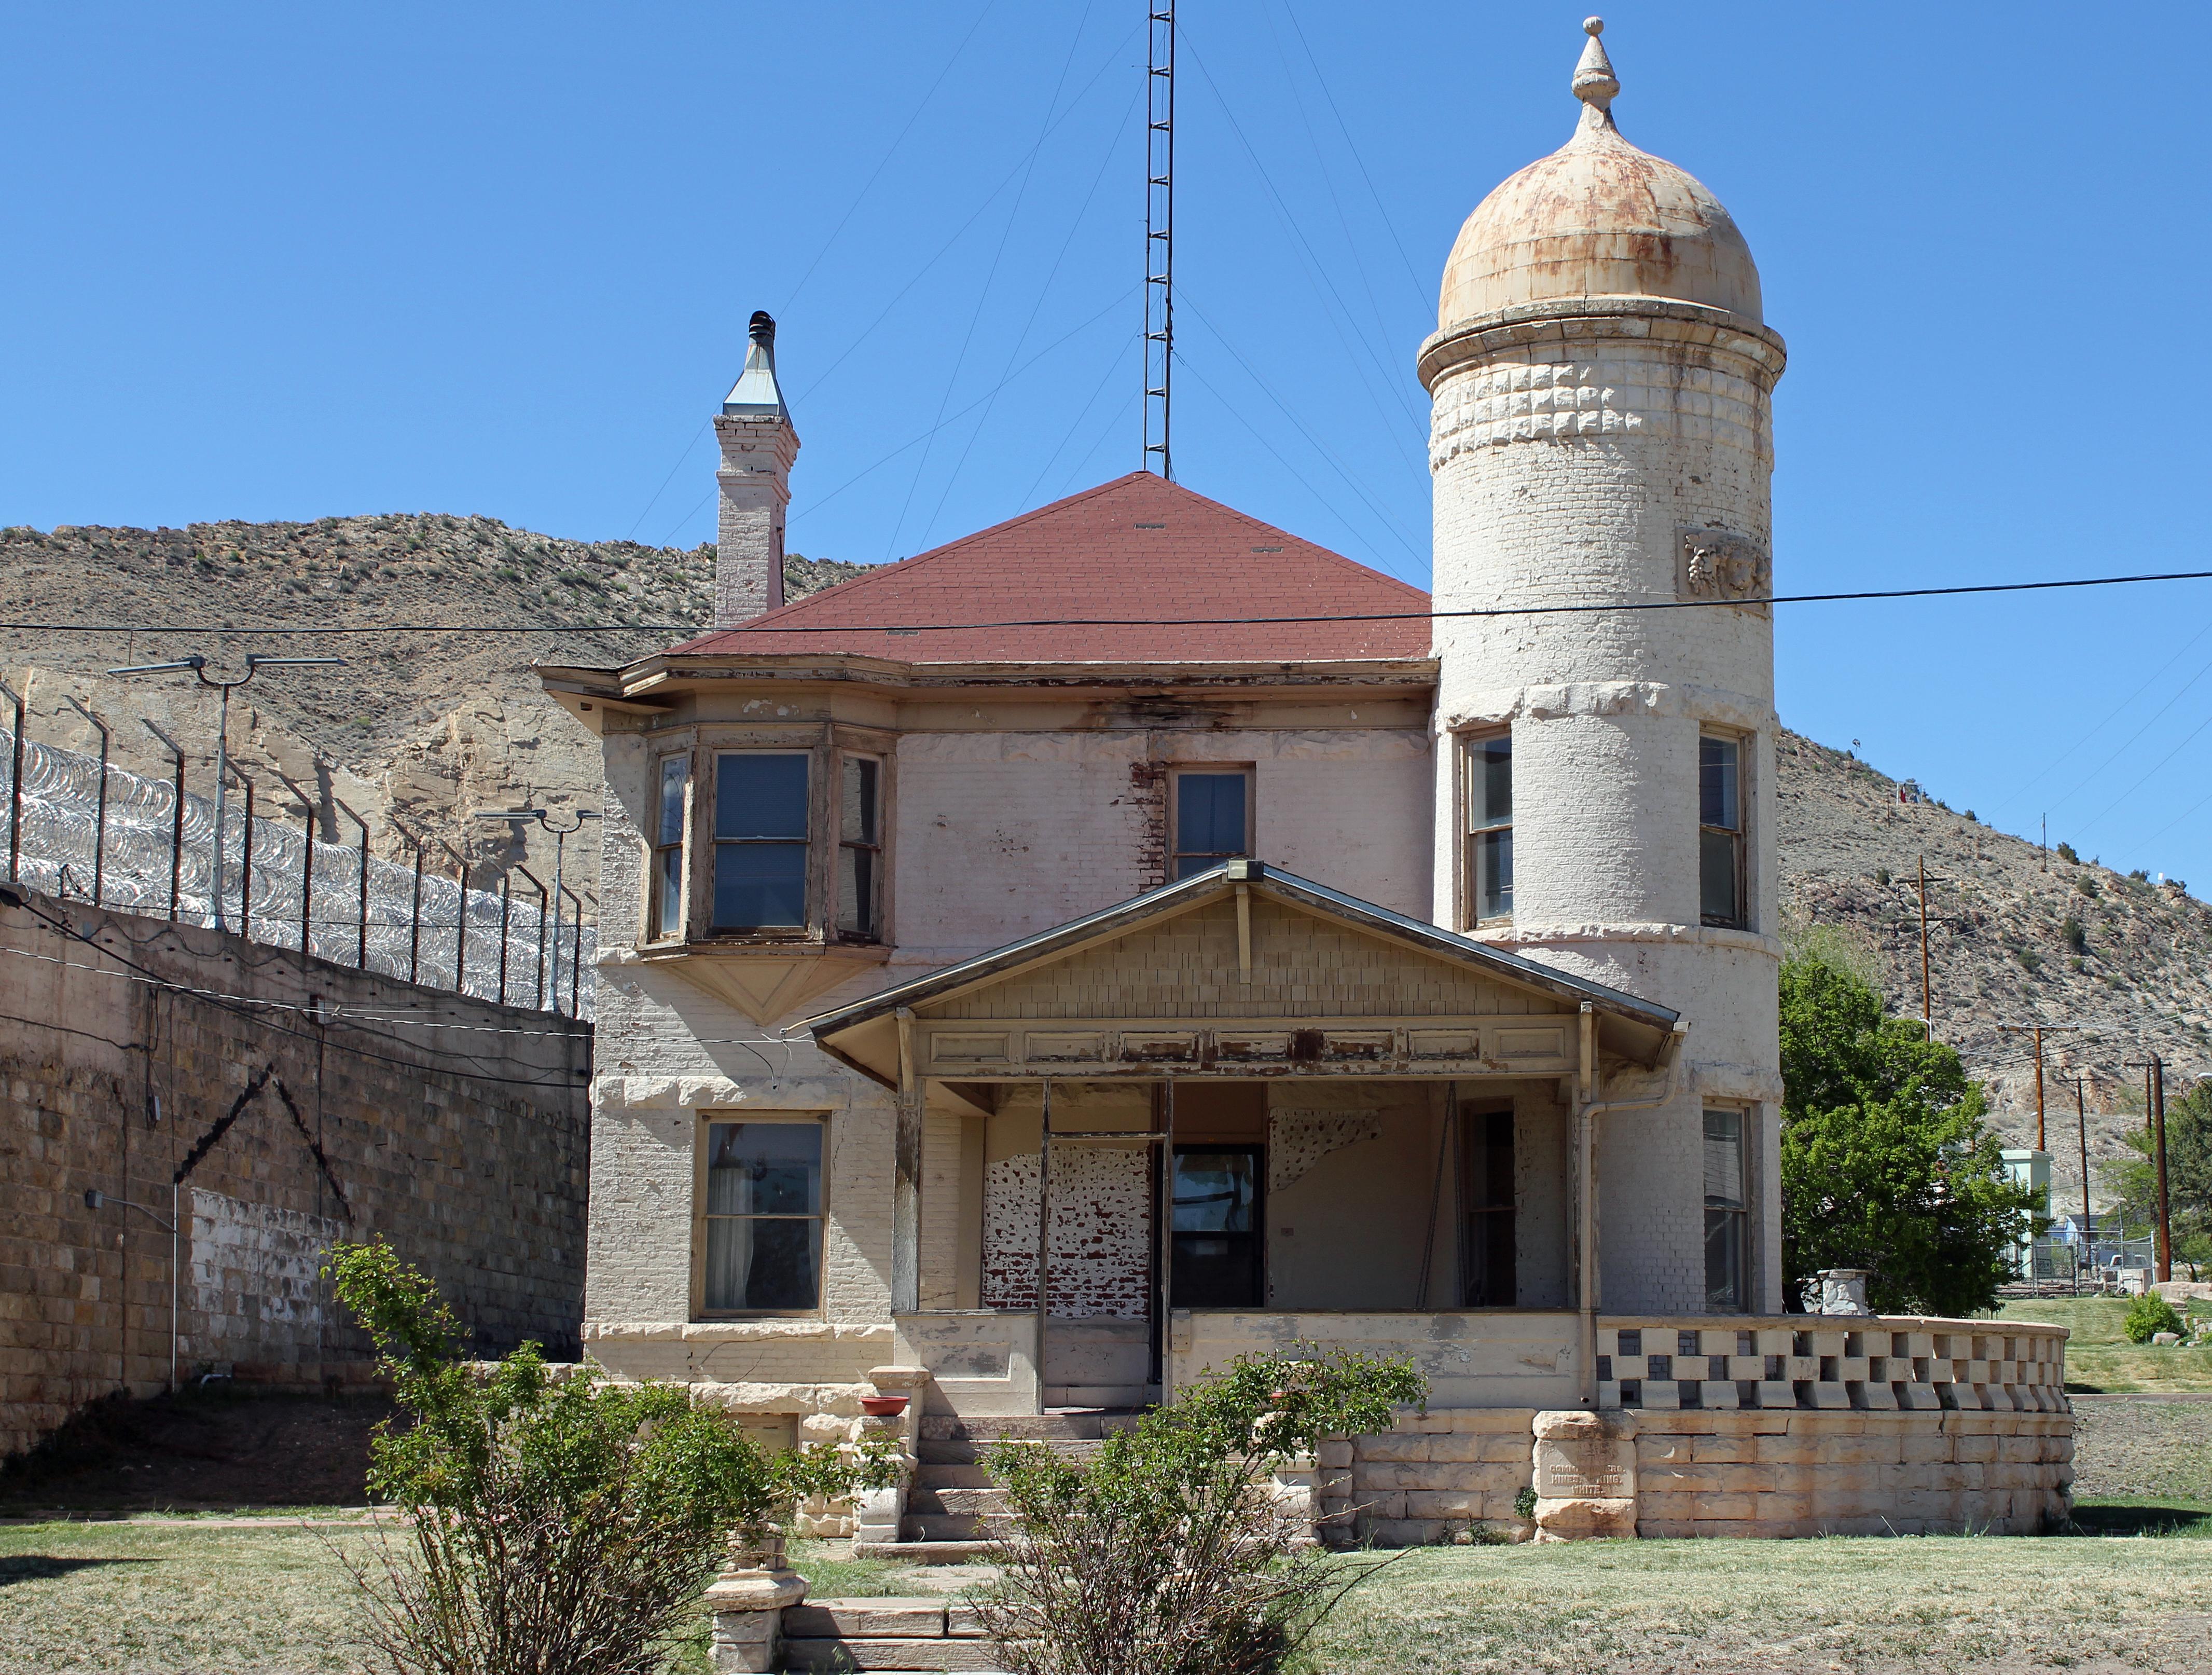 Colorado Territorial Correctional Facility - Wikipedia